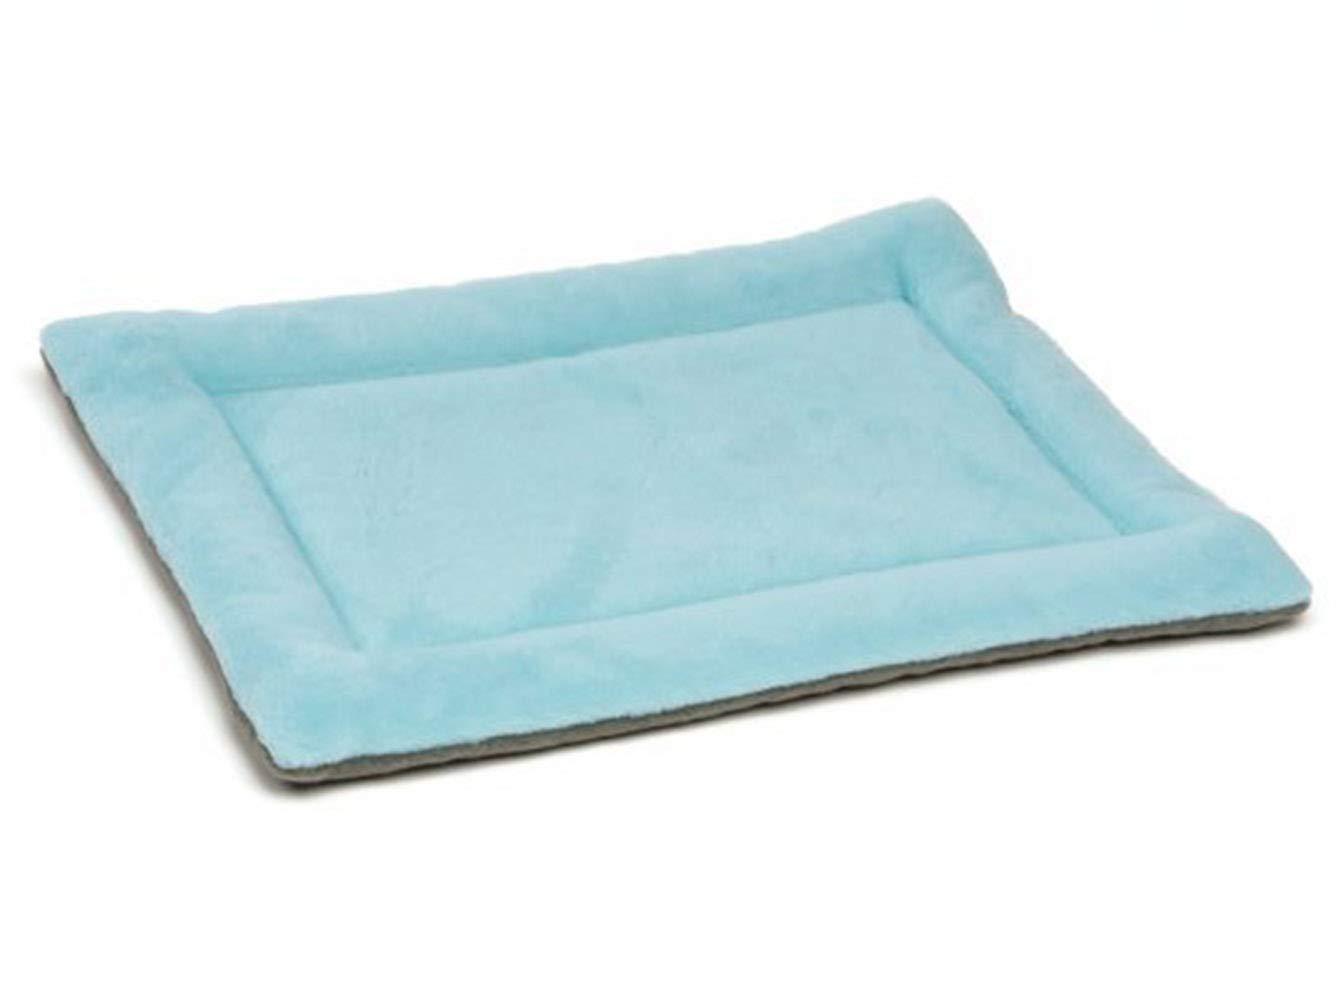 bluee S bluee S Jim Hugh Dog Mat Cozy Pet Dog Cat Coral Fleece Blanket Winter Soft Solid Puppy Cushion Pet Carpet Durable Dog Bed Pet Supplies